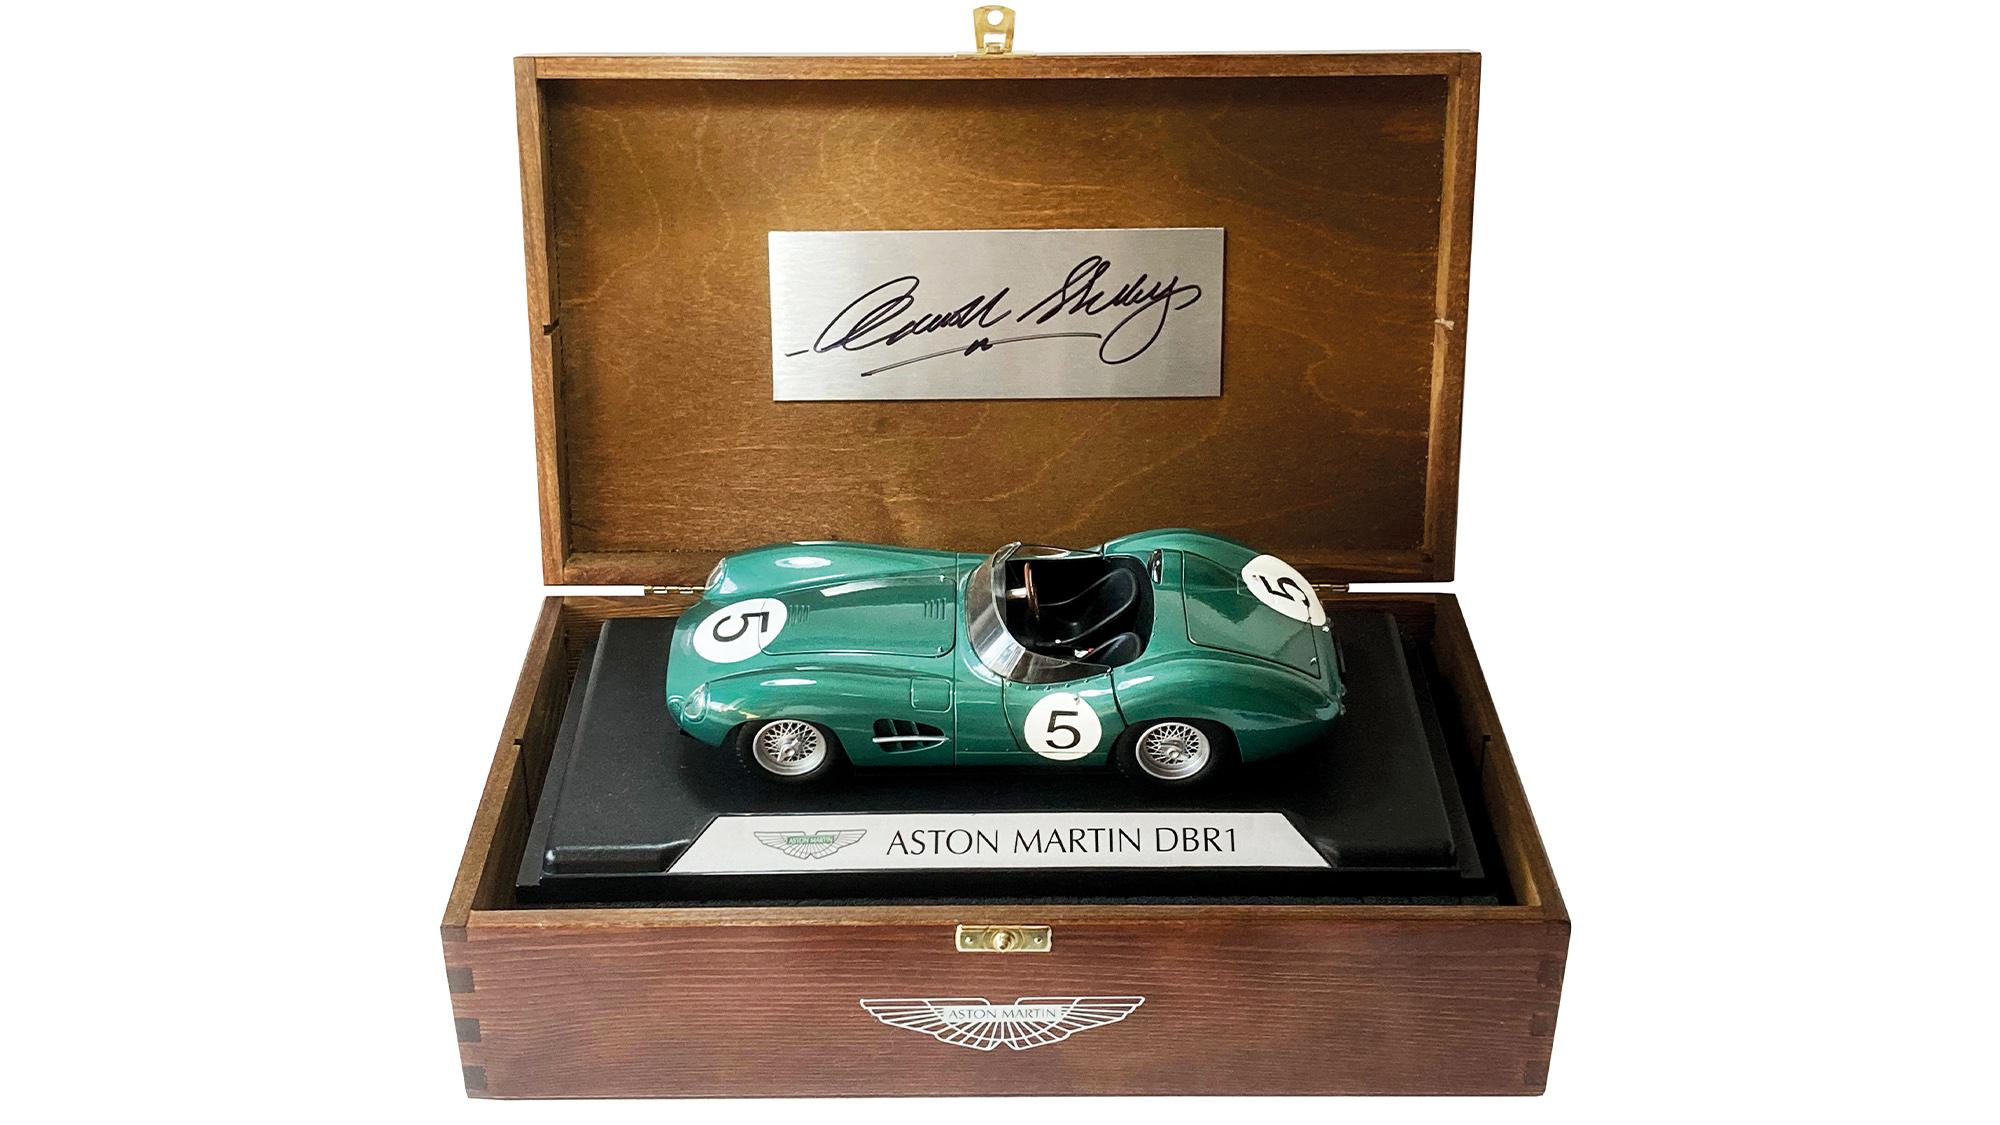 Aston Martin Carroll Shelby model